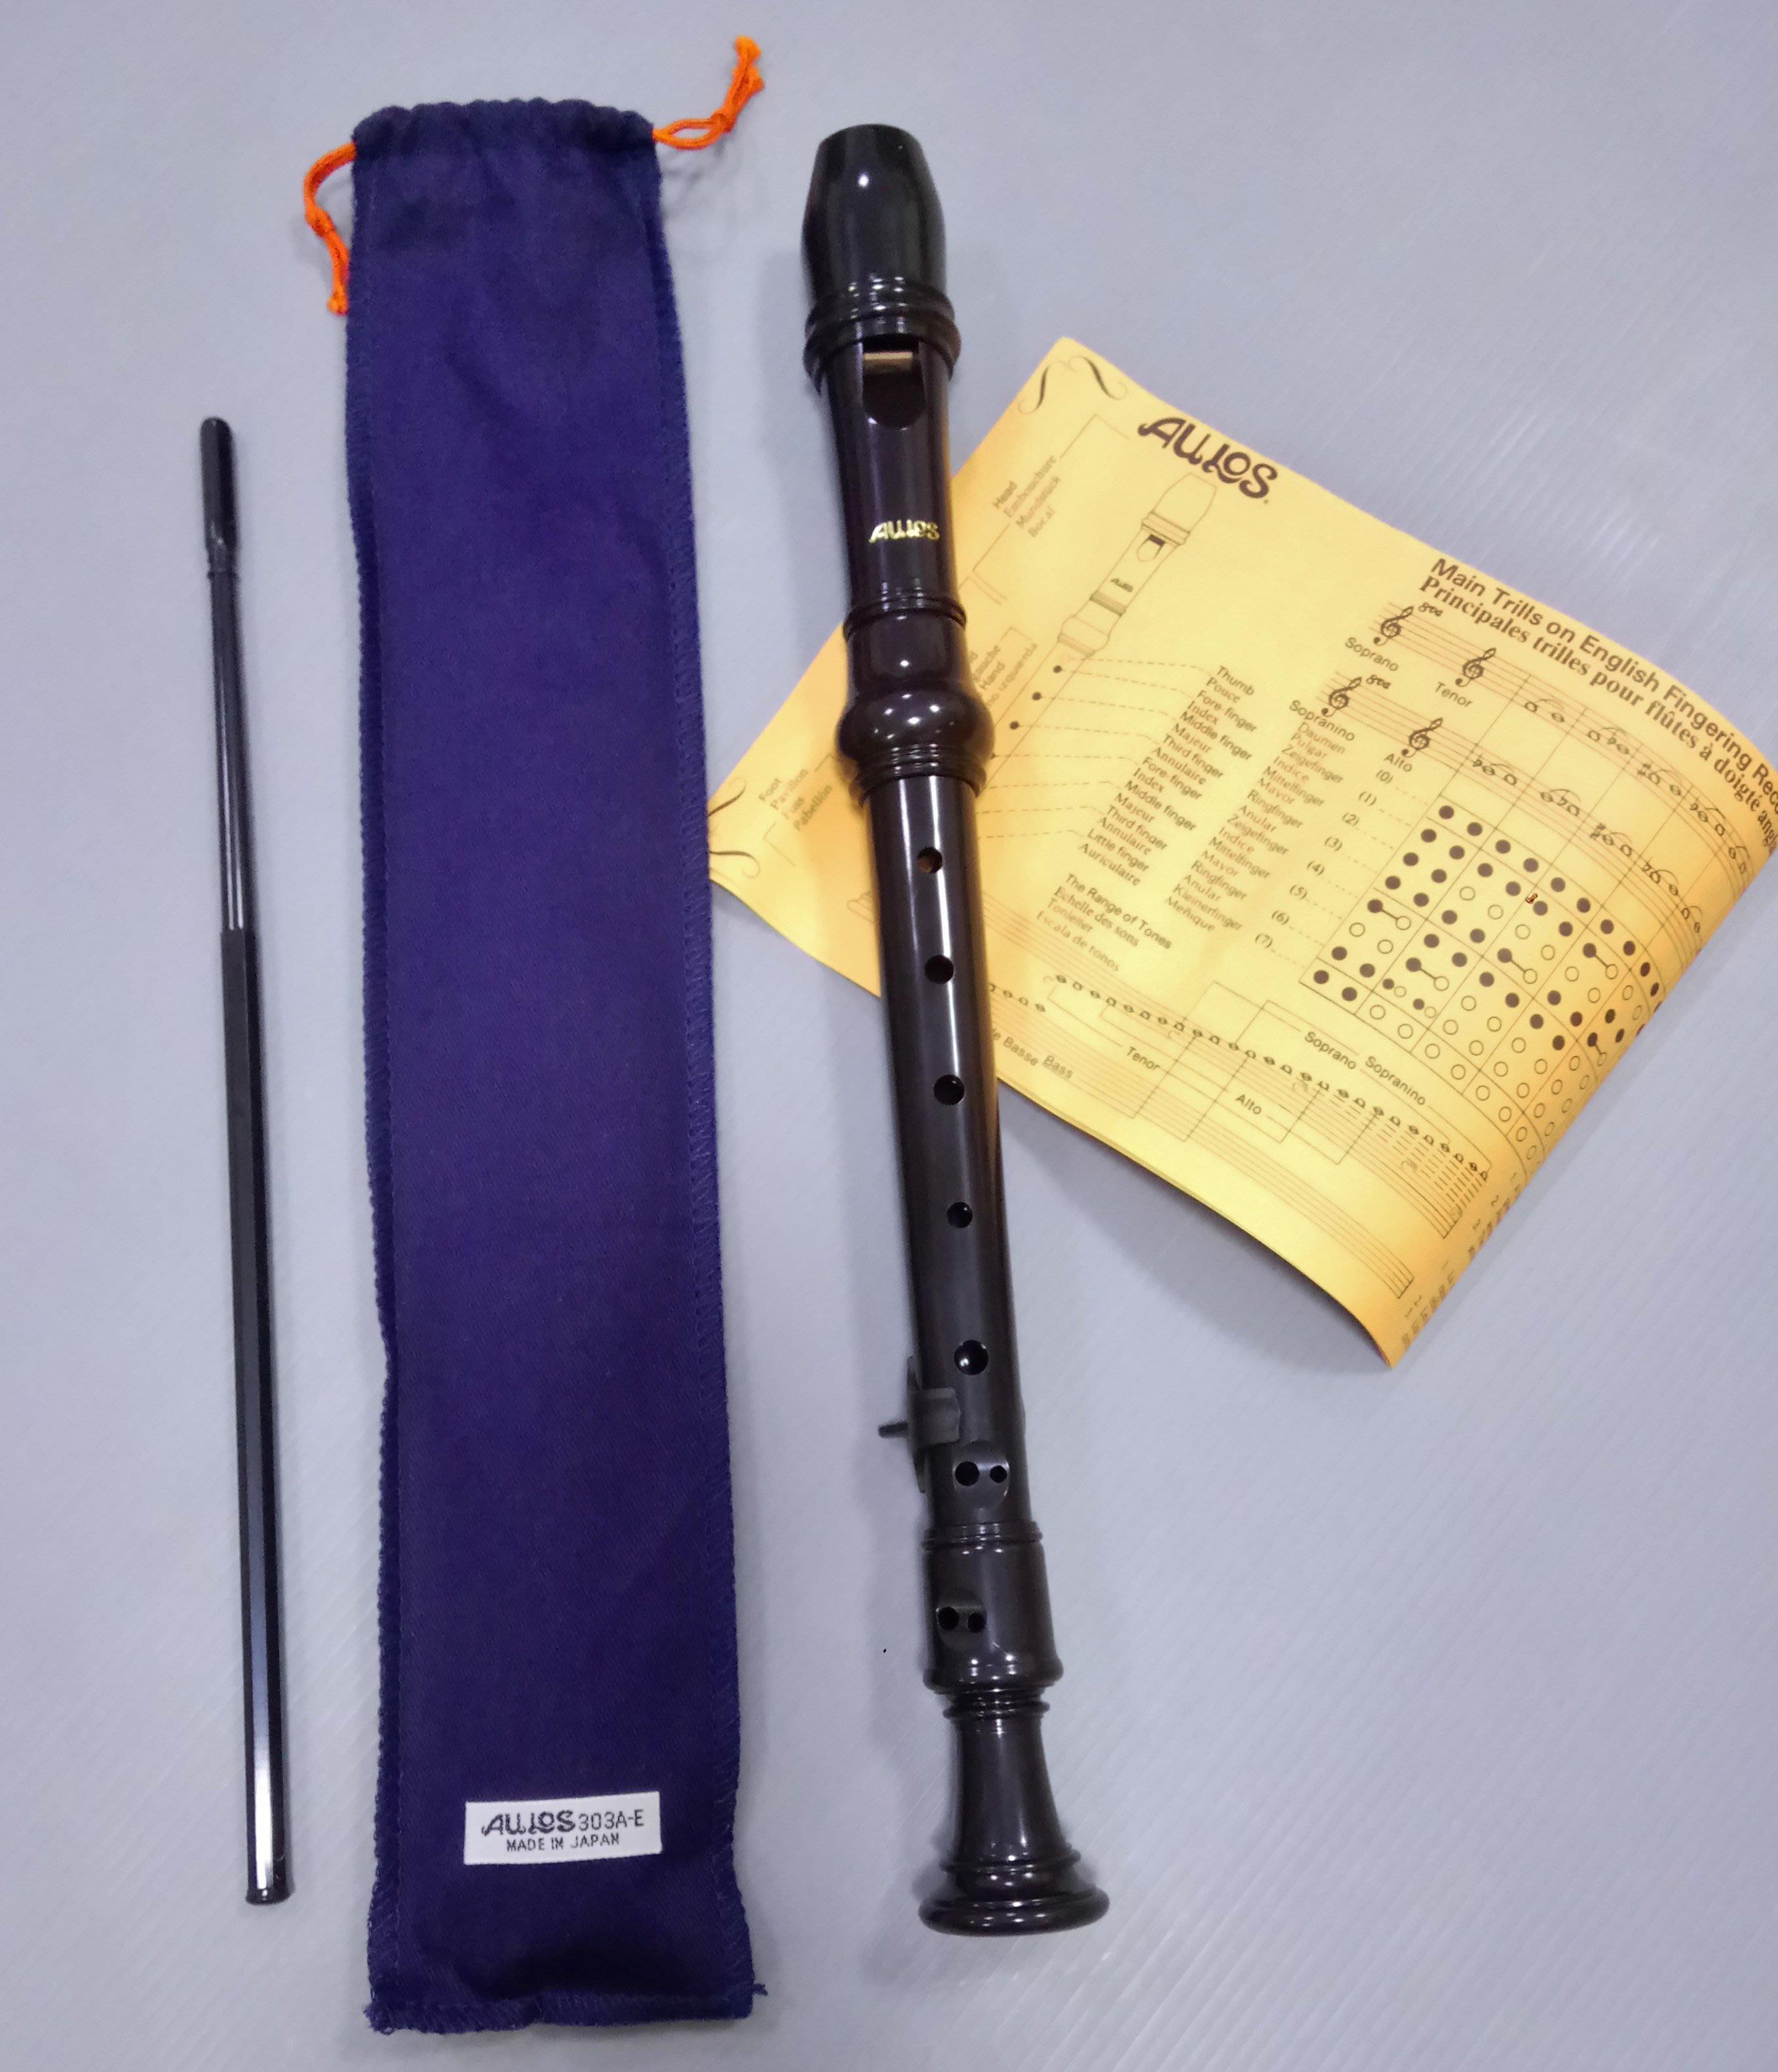 AULOS 303A 高音直笛 贈指托 日製 303A-E 英式直笛 【樂器城堡】